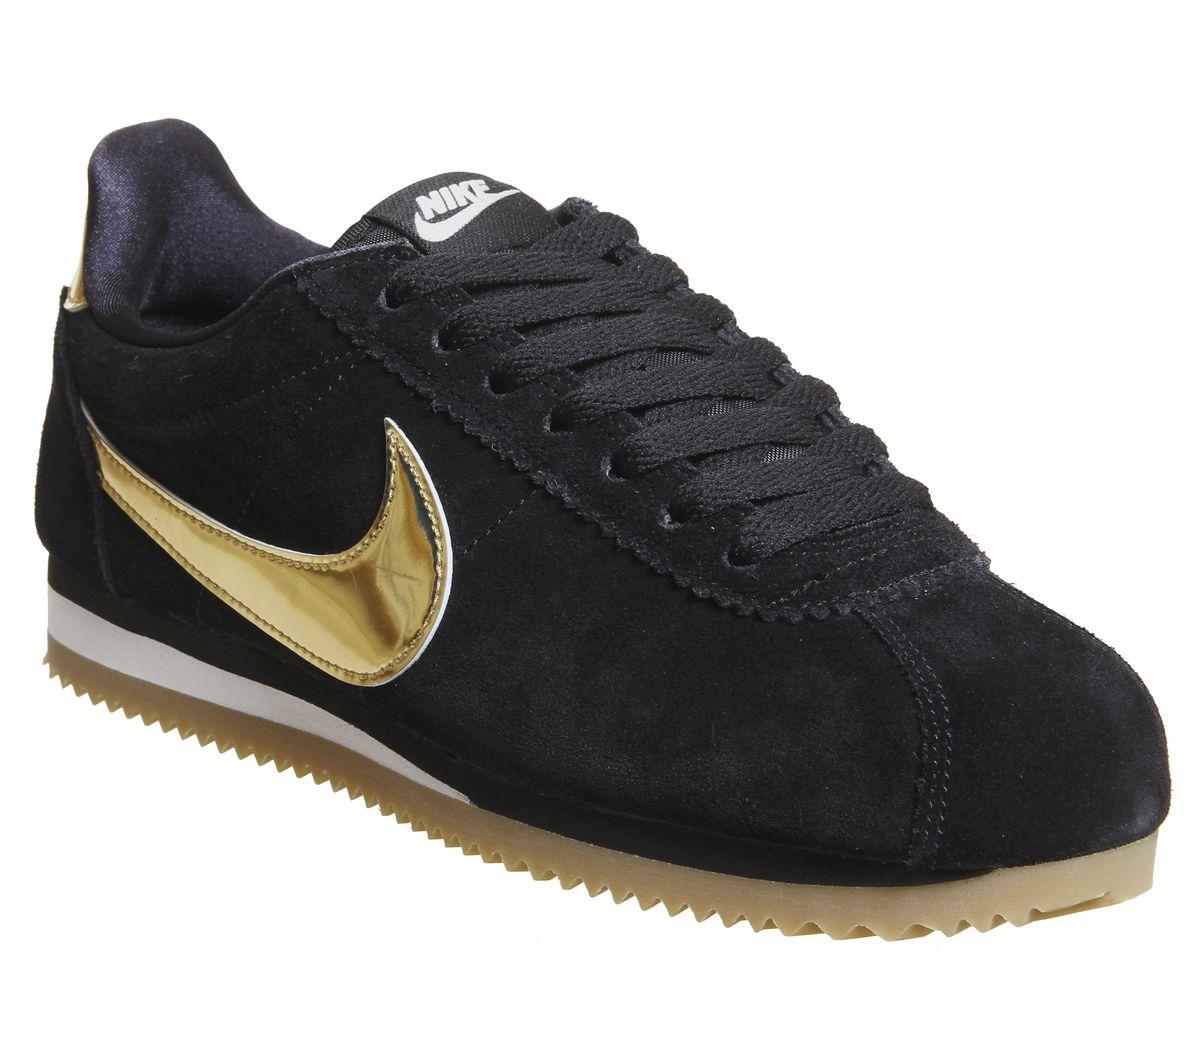 best sneakers 6533e dae9f Nike Classic Cortez Og Trainers Black Metallic Gold Phantom ...